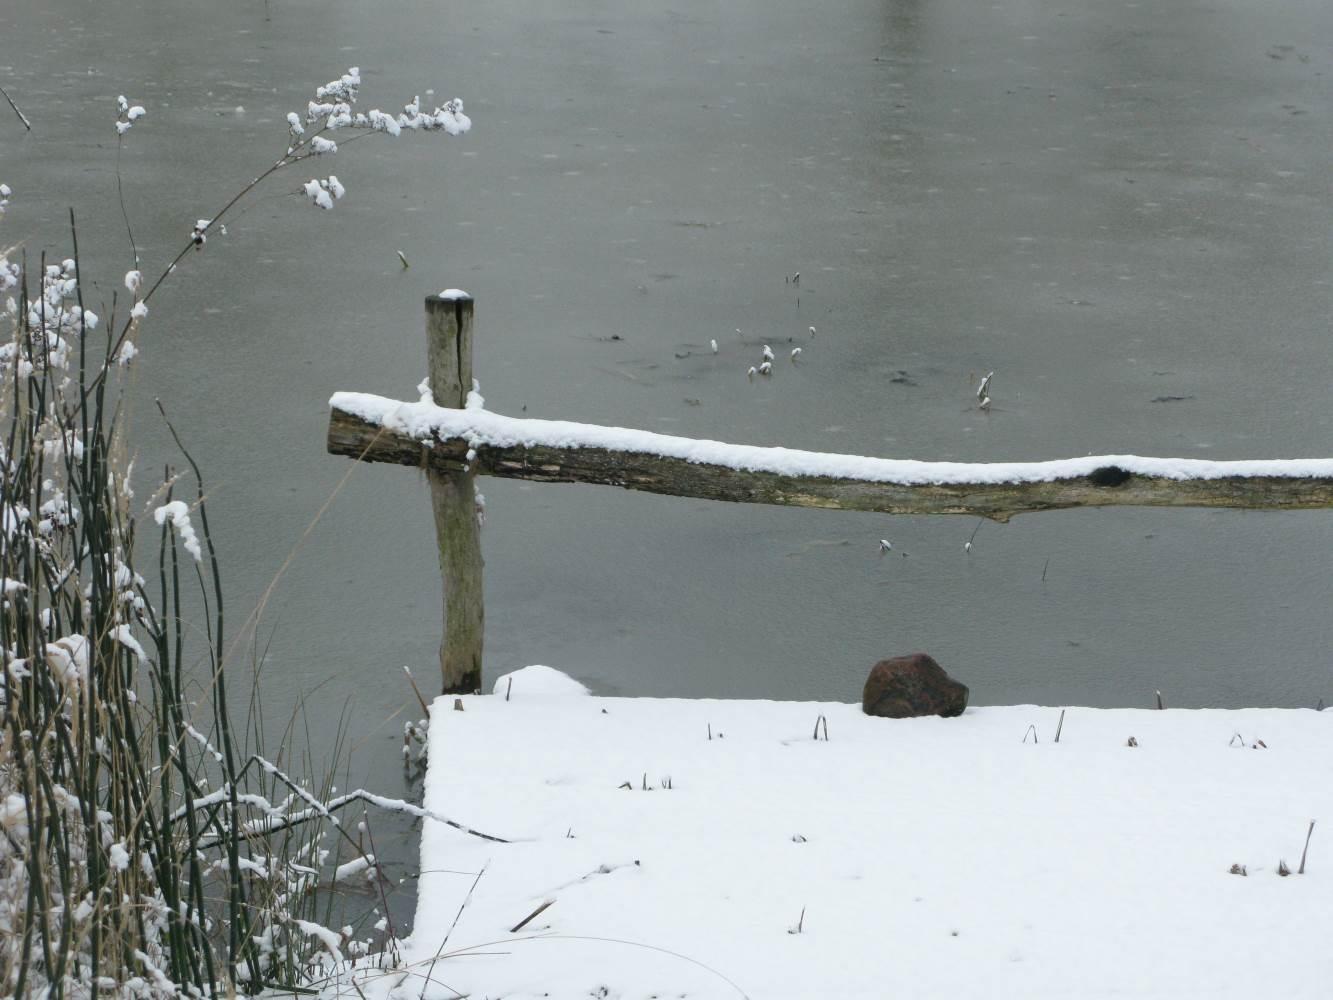 Winter am Teich © Lars Baus 2013